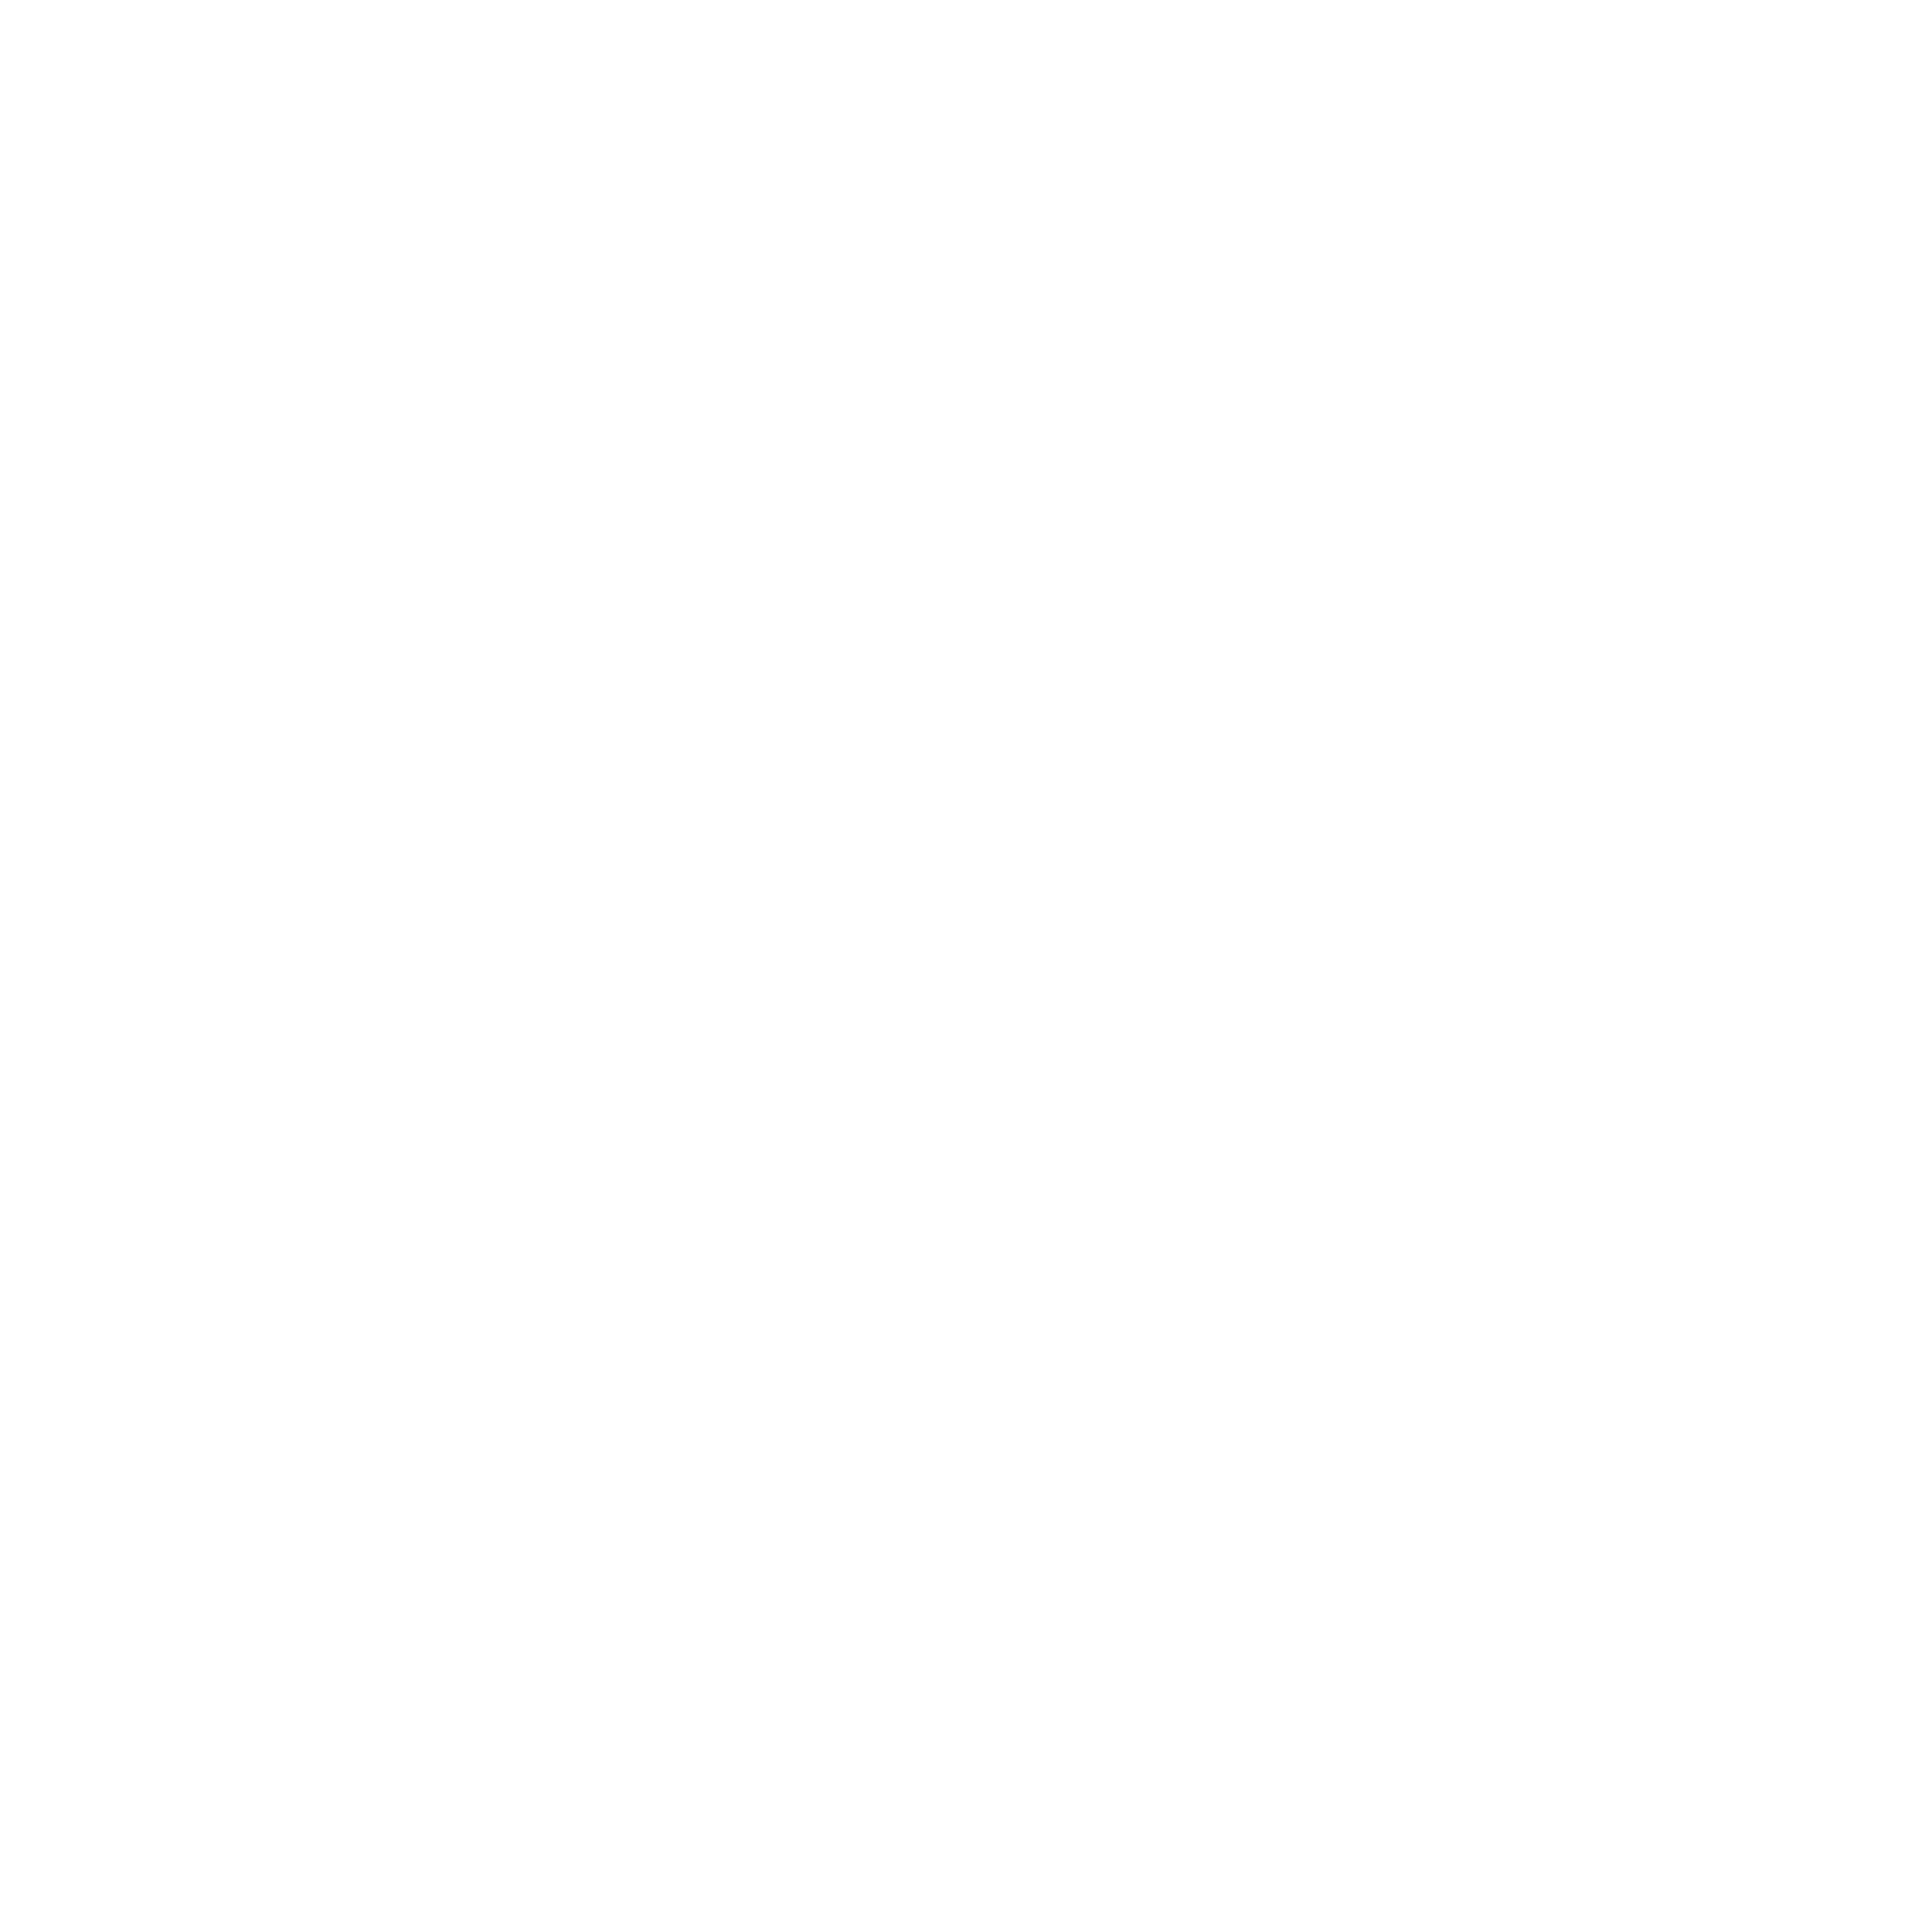 2000px-Event finder.png